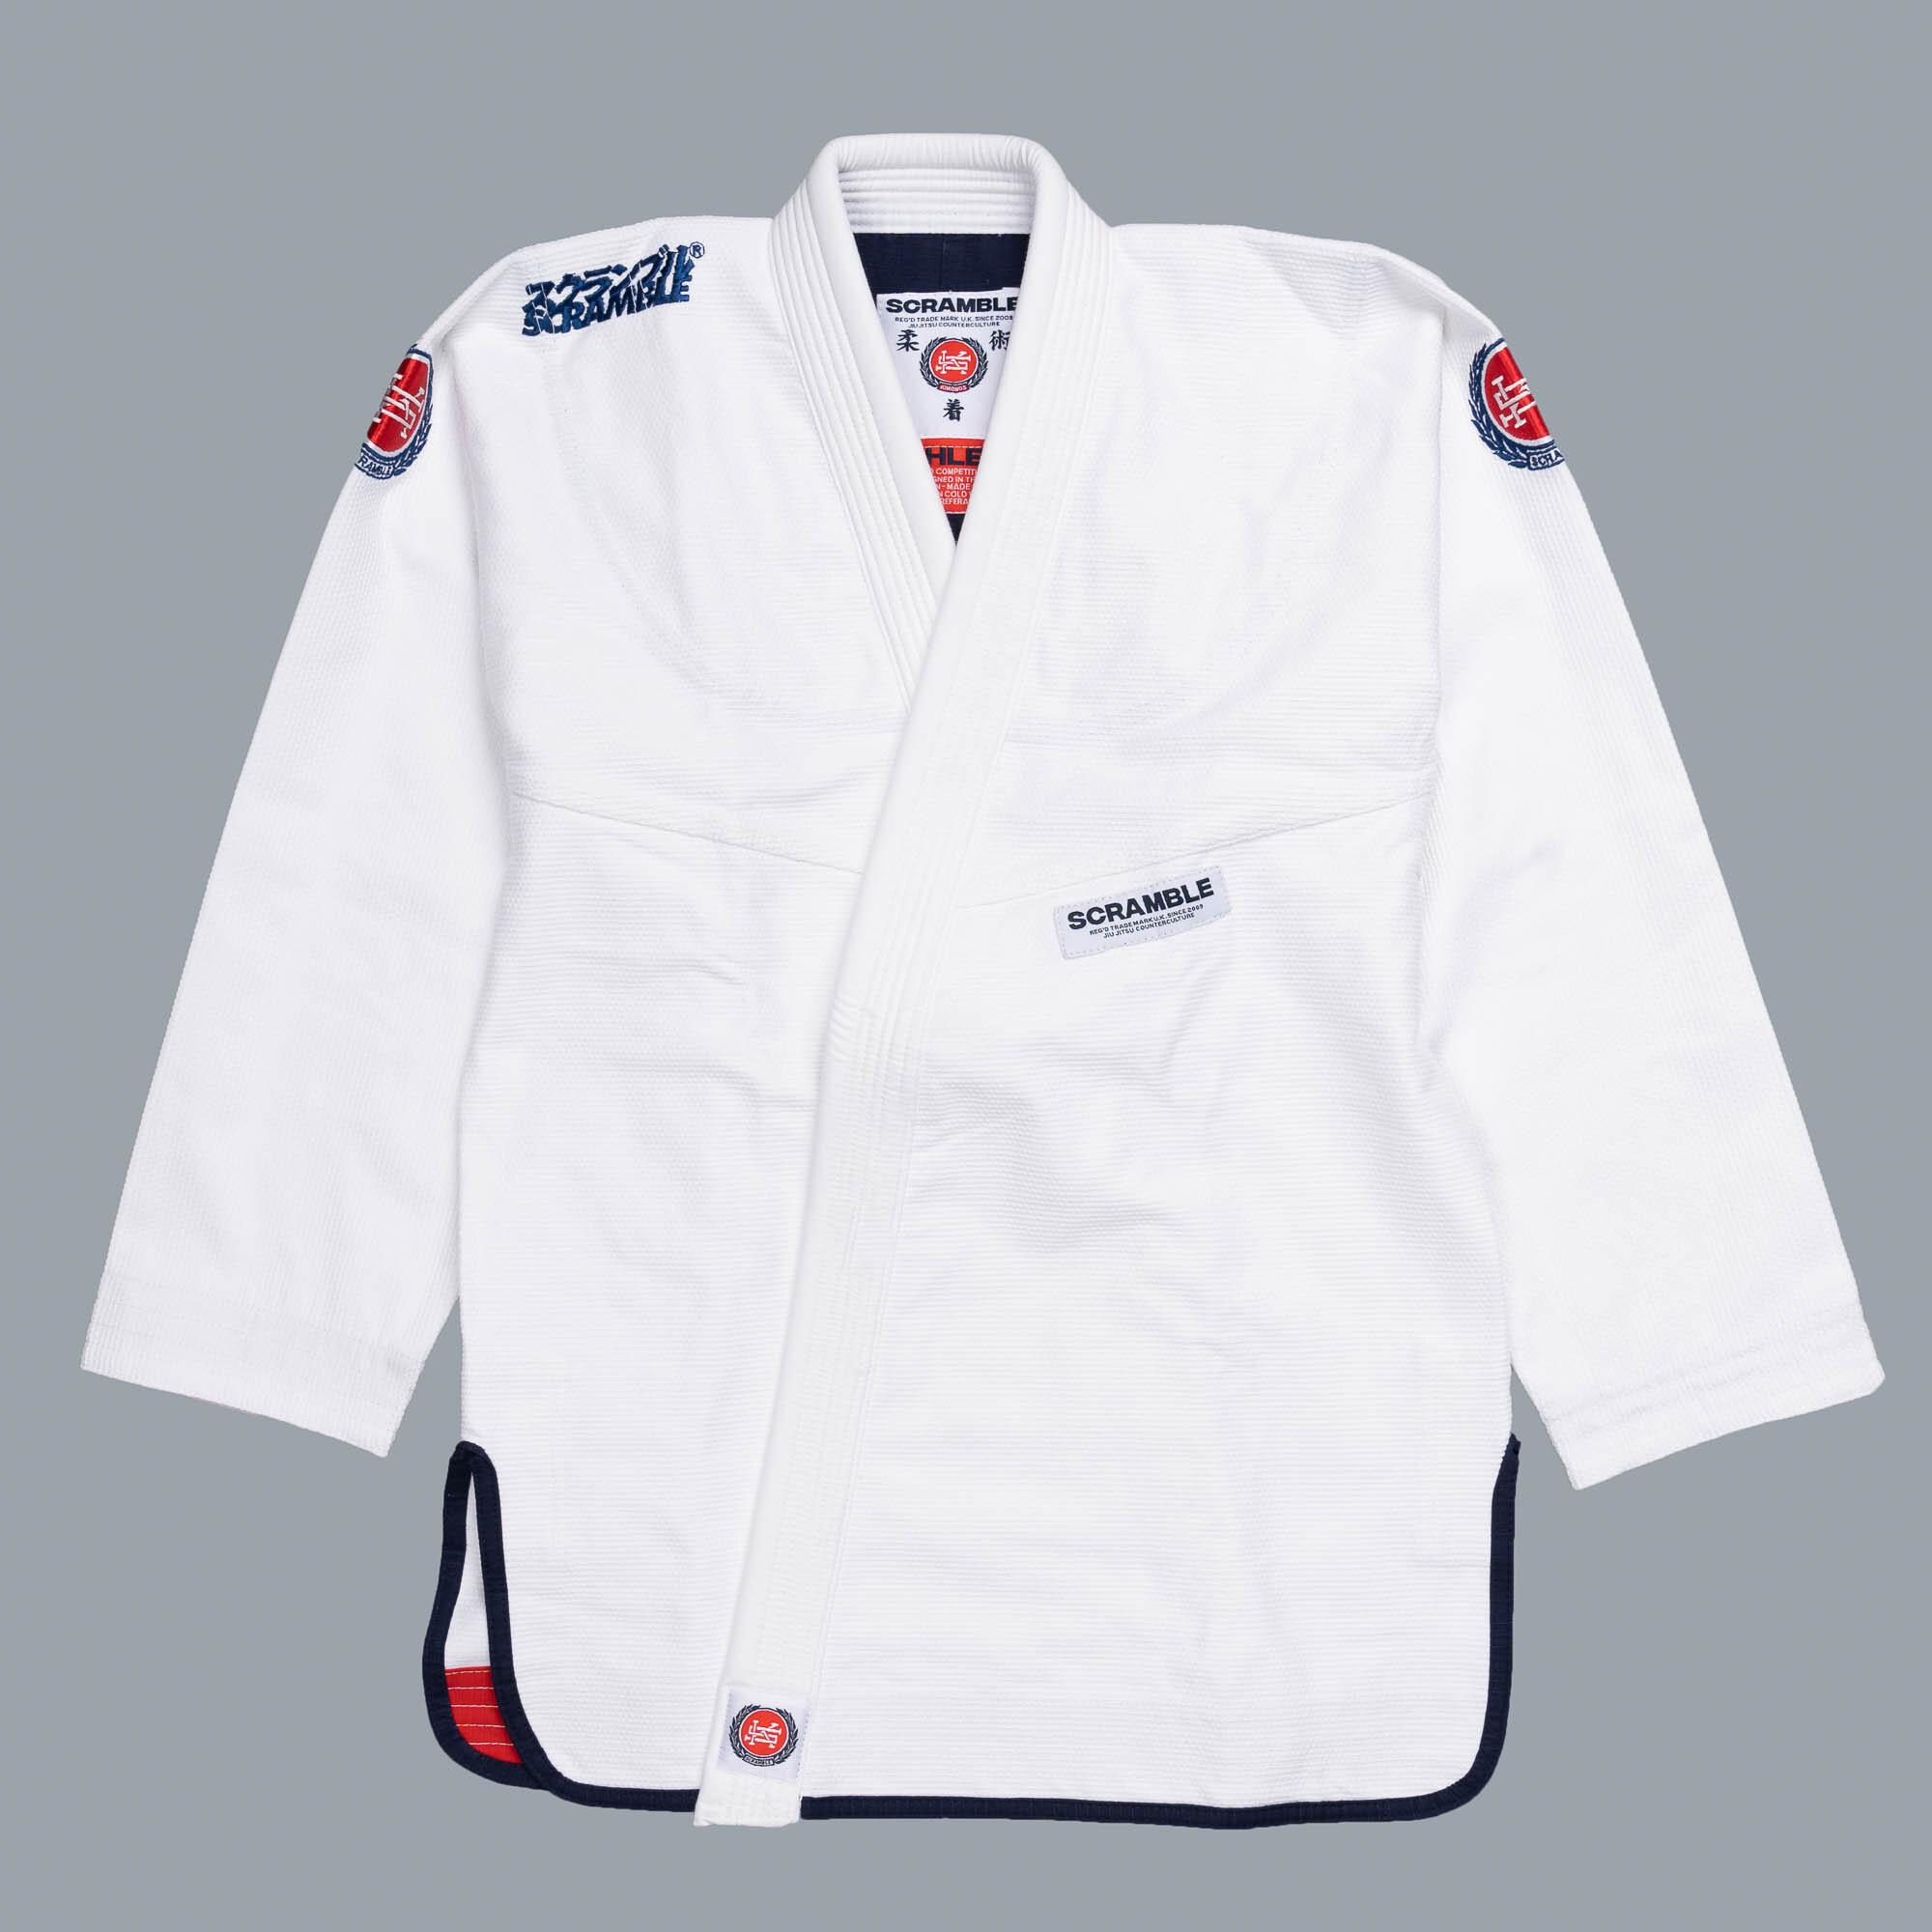 SCRAMBLE ATHLETE ホワイト ブラジリアン柔術衣